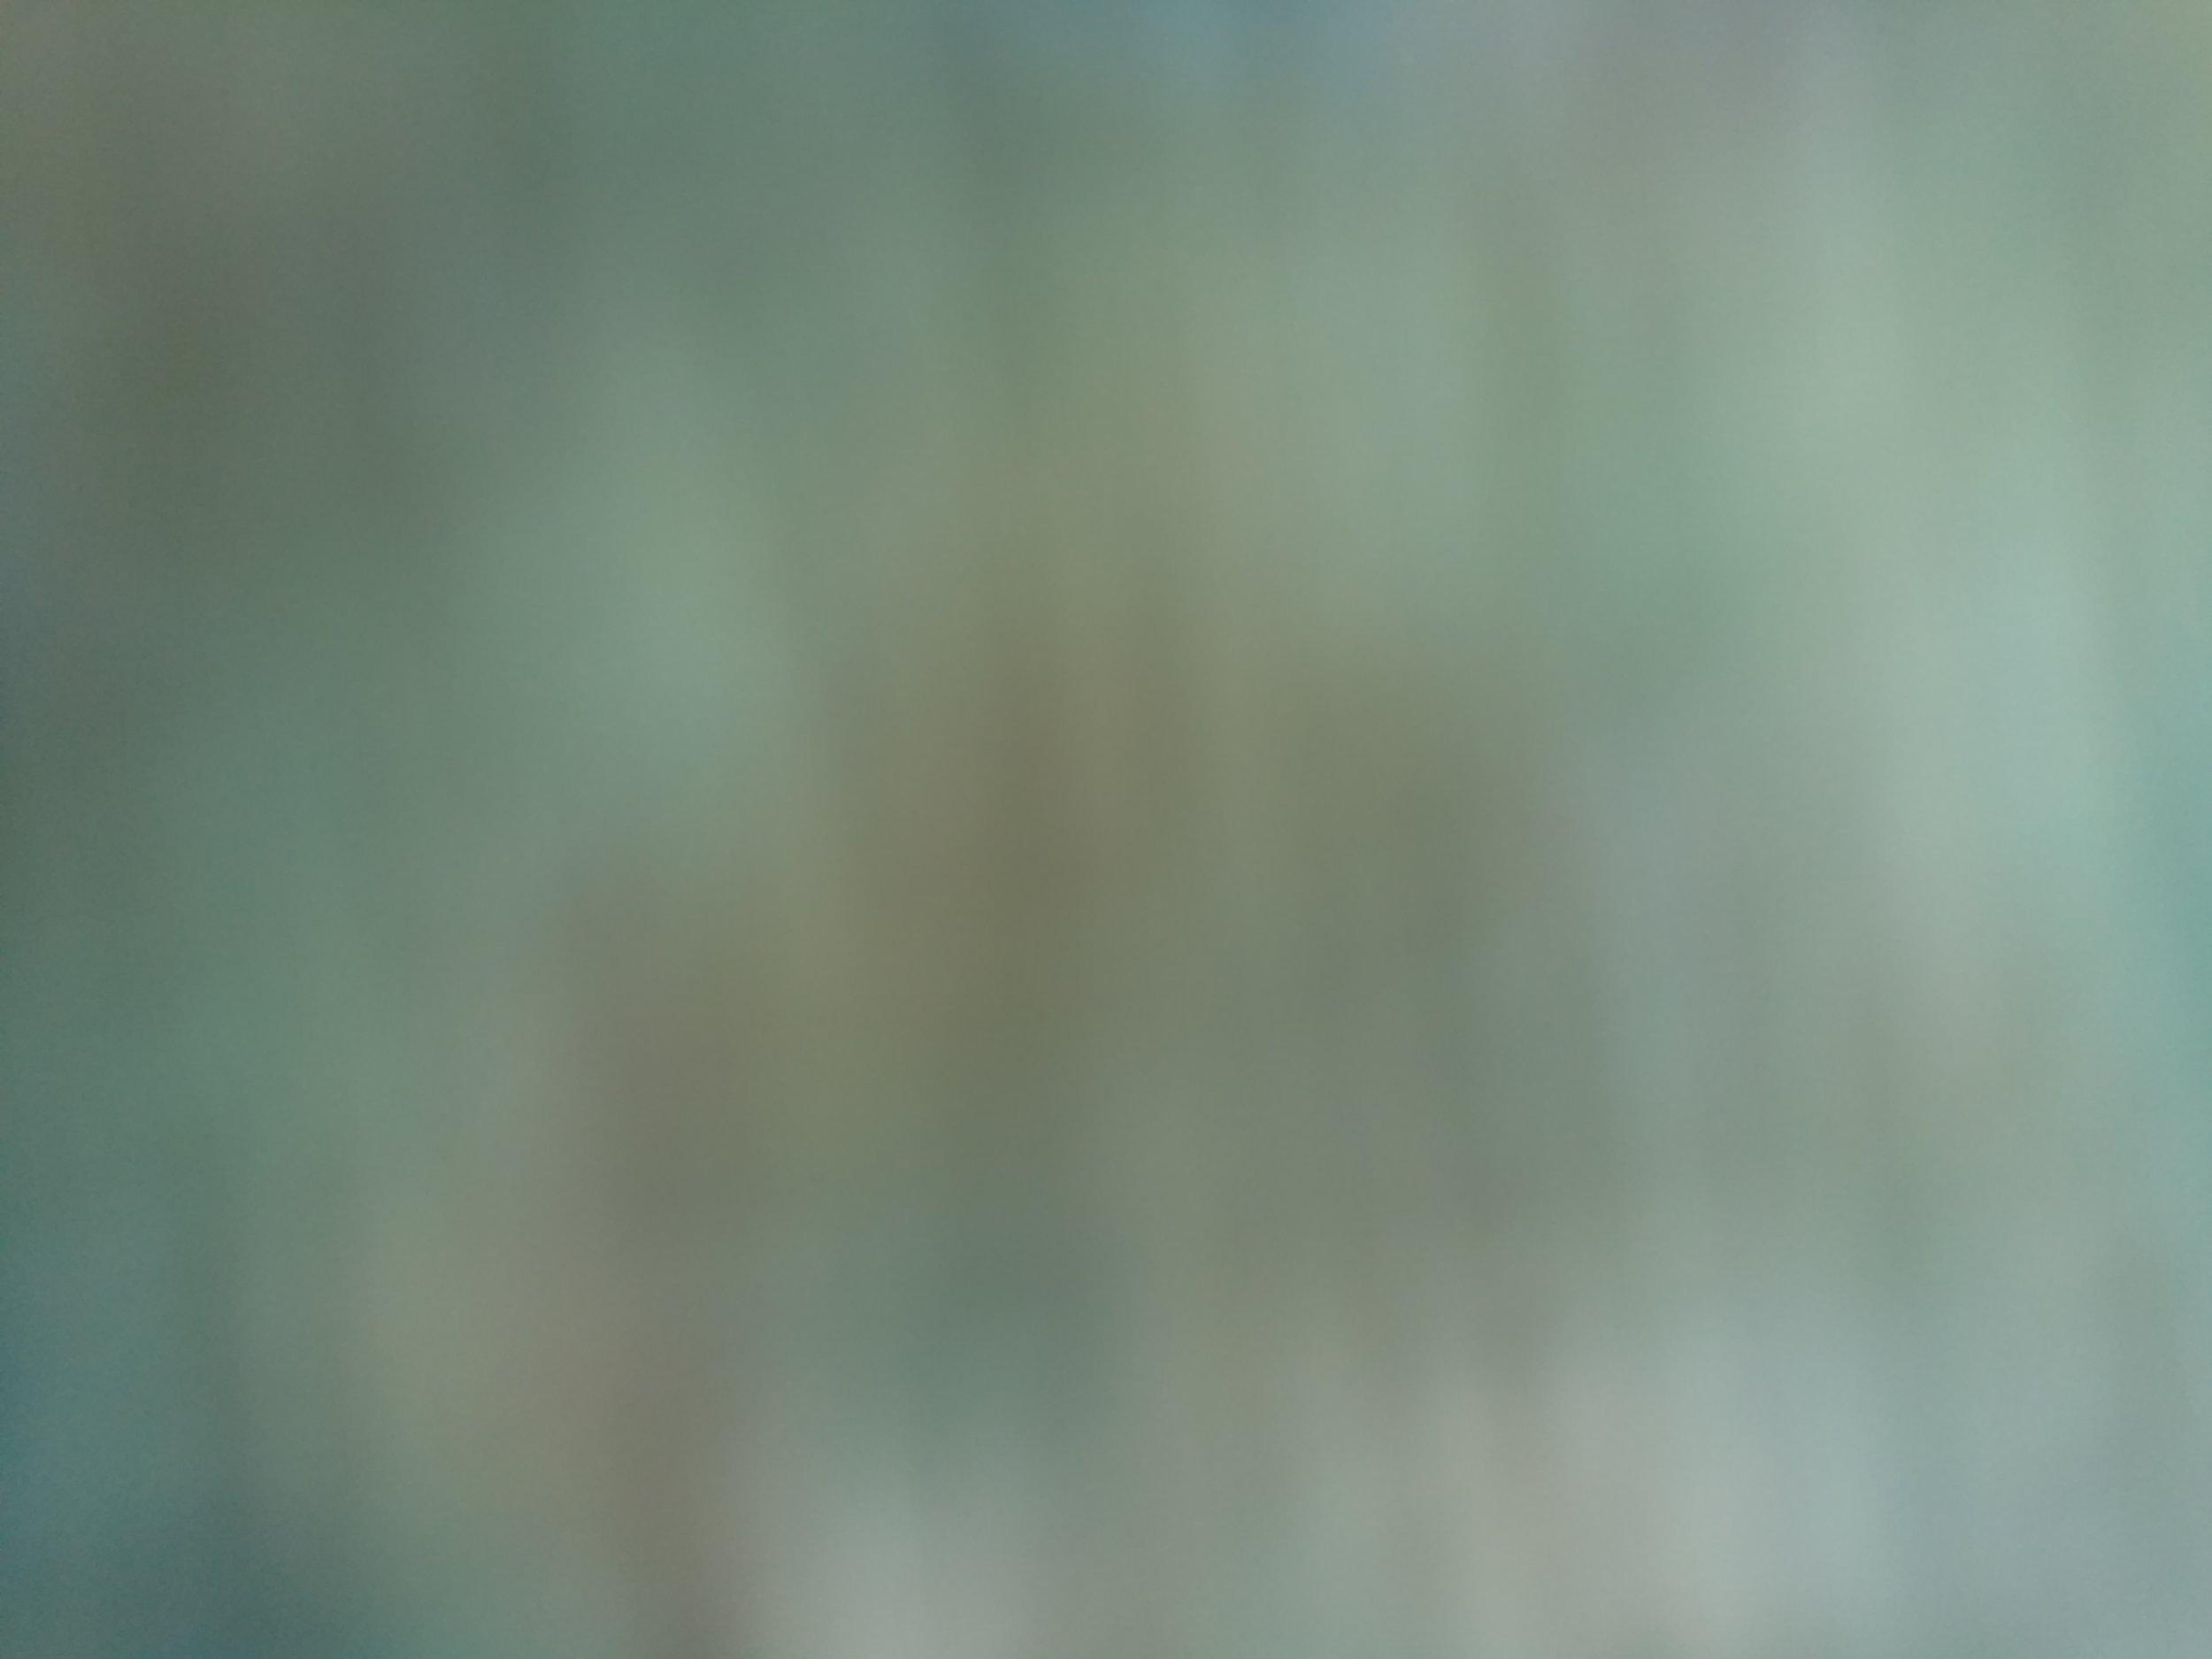 willroth-co-free-texture-gradient-045.jpg